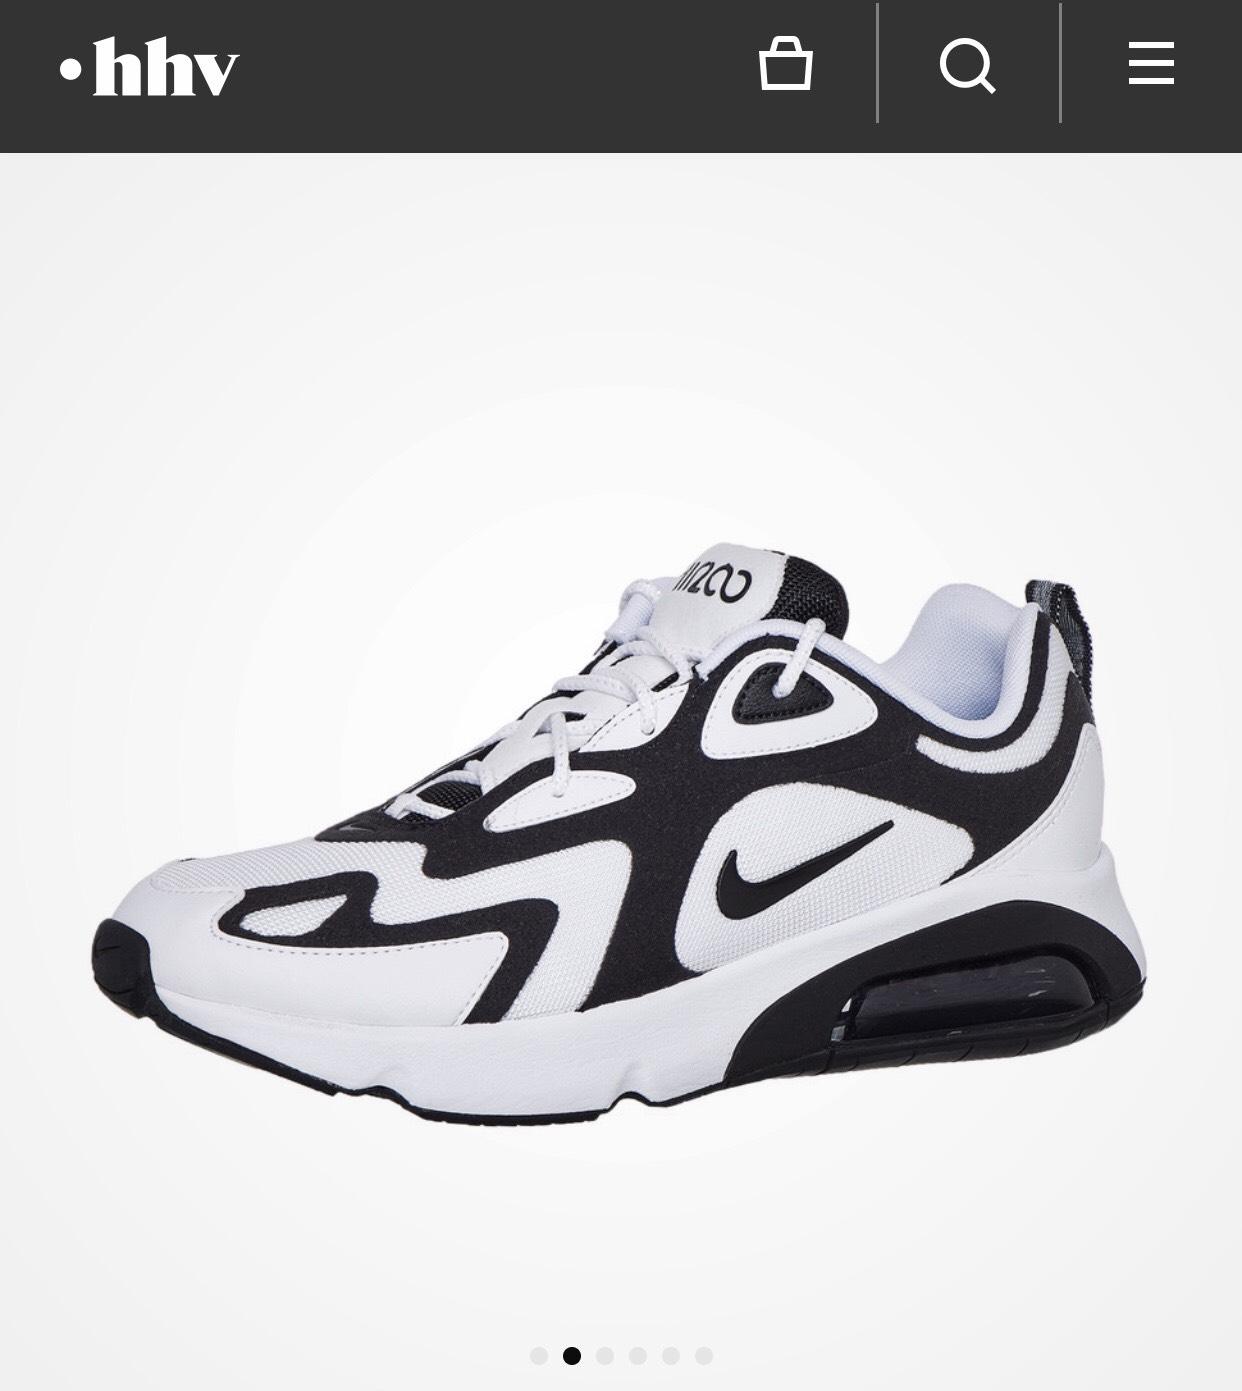 Nike Air Max 200 (White / Black / Anthracite)